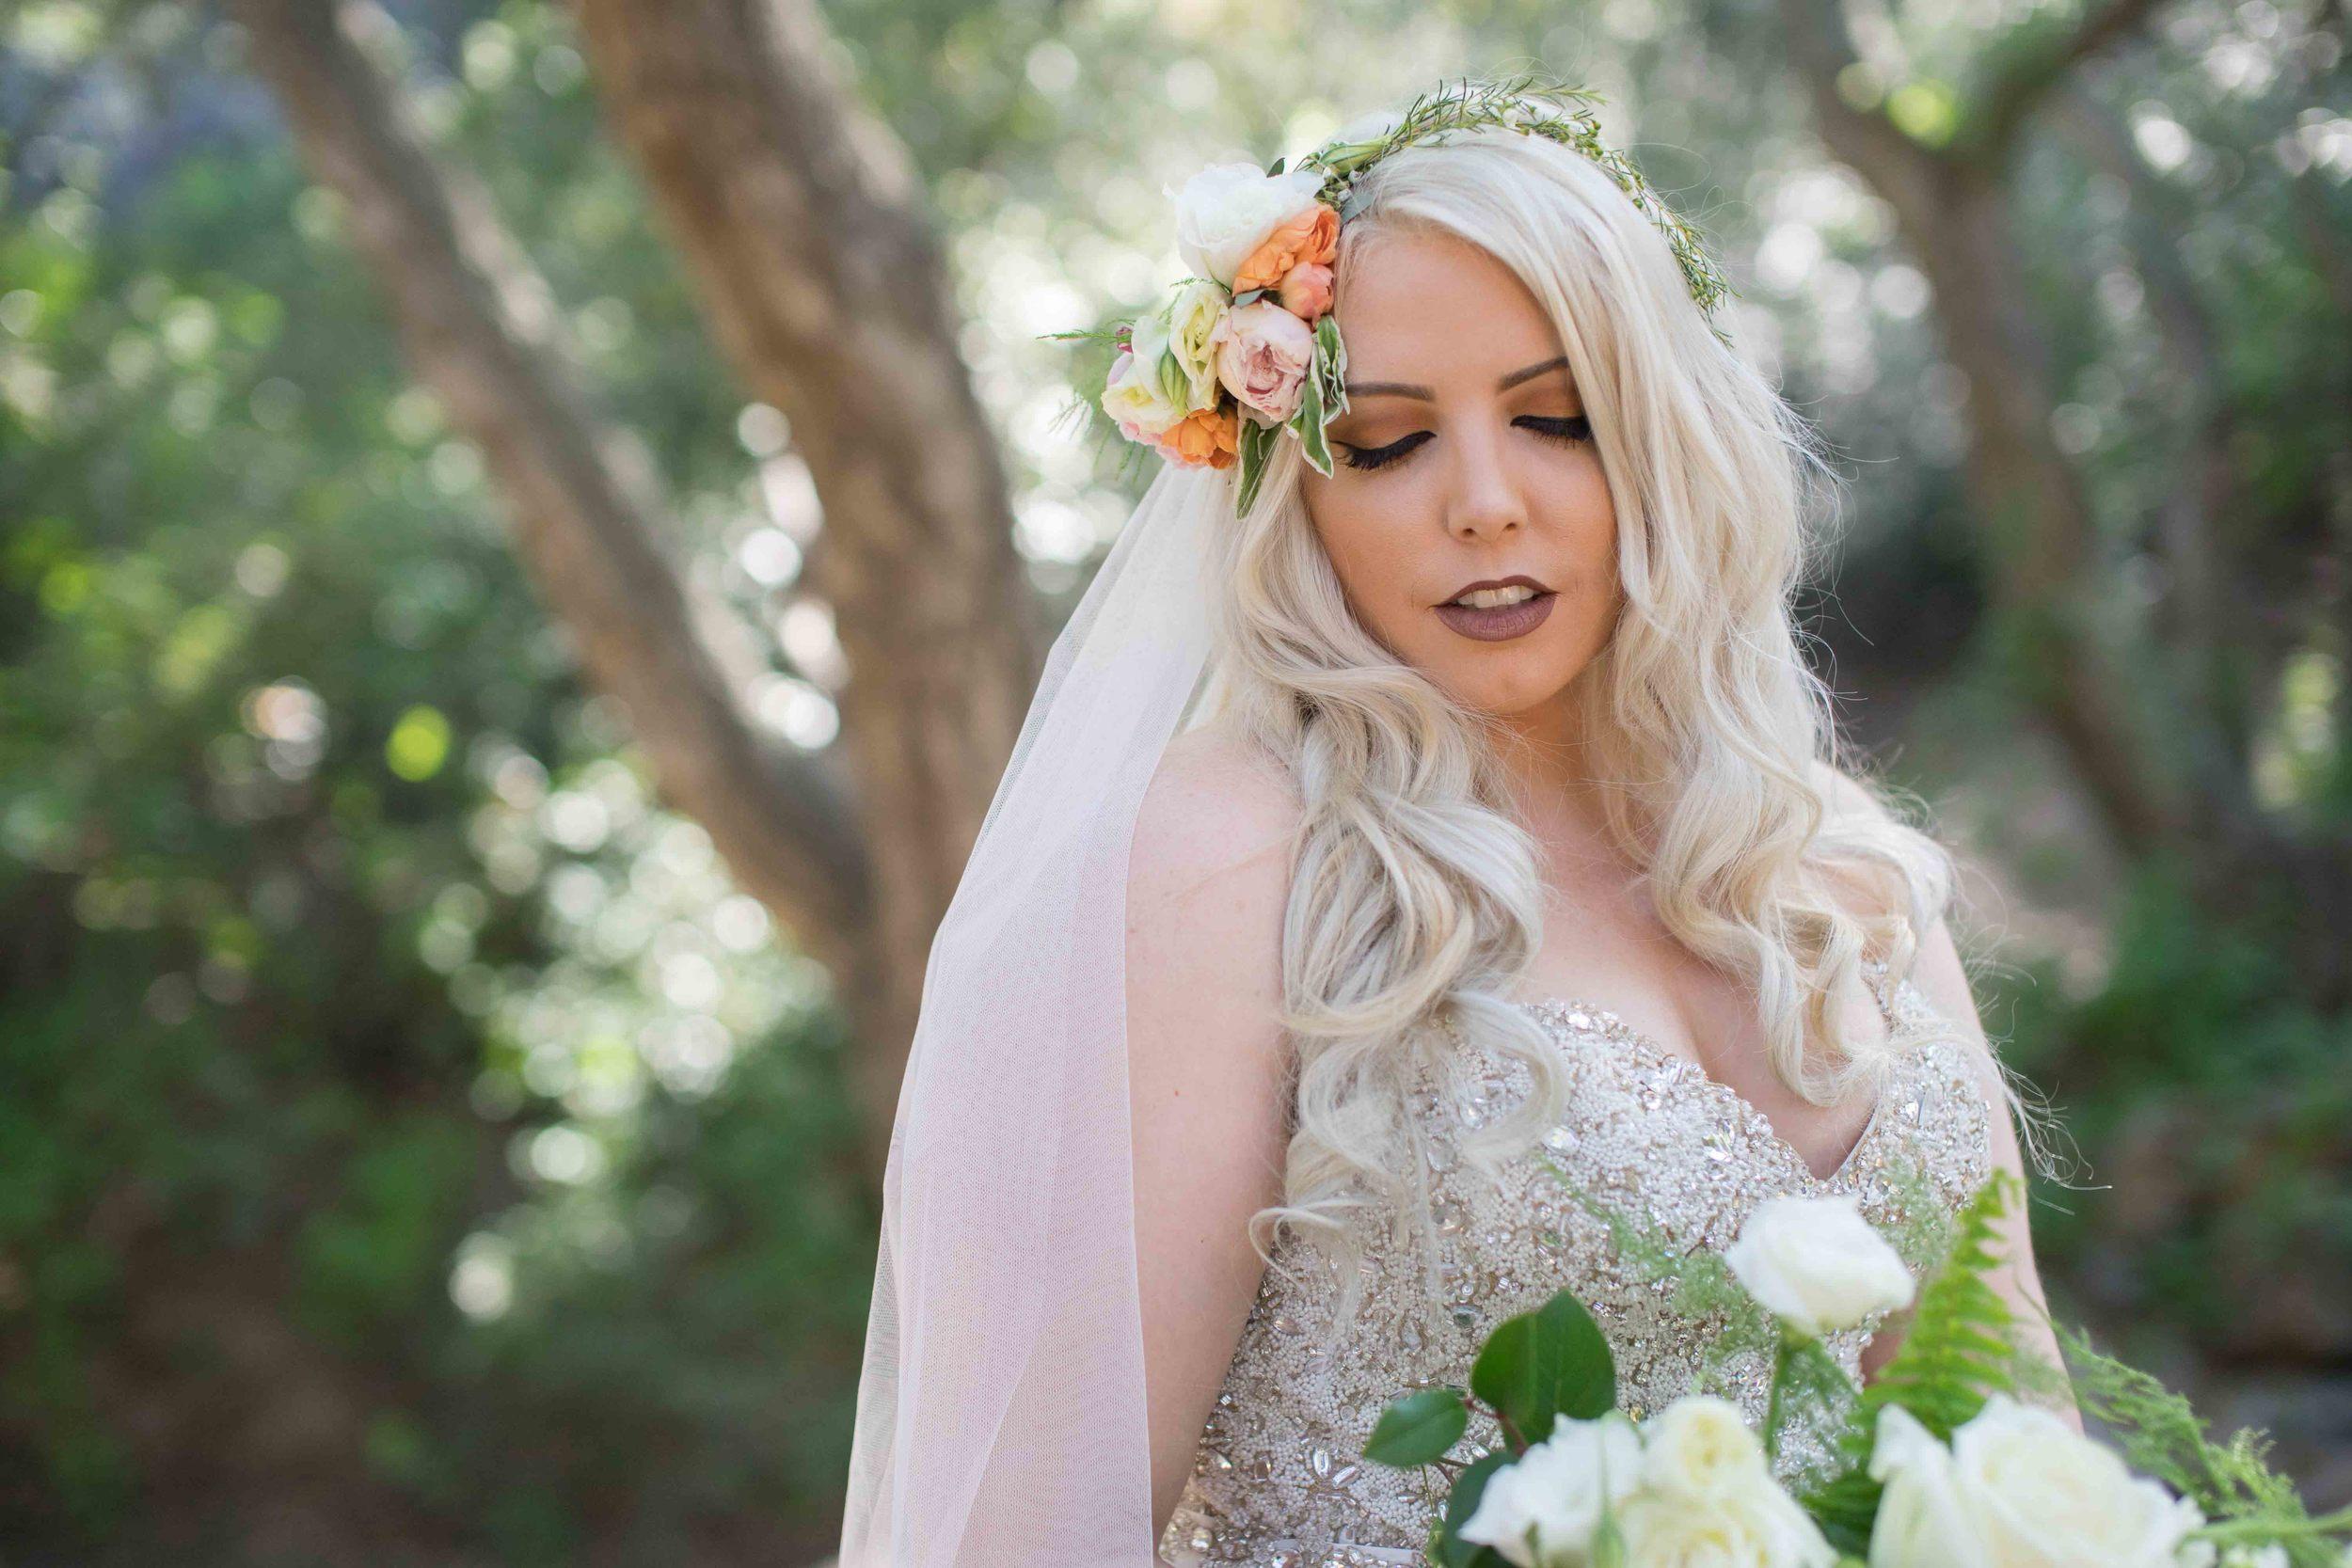 Kiara_and_Corbin_WEDDING_ Brienne_Michelle_Photography_039.JPG